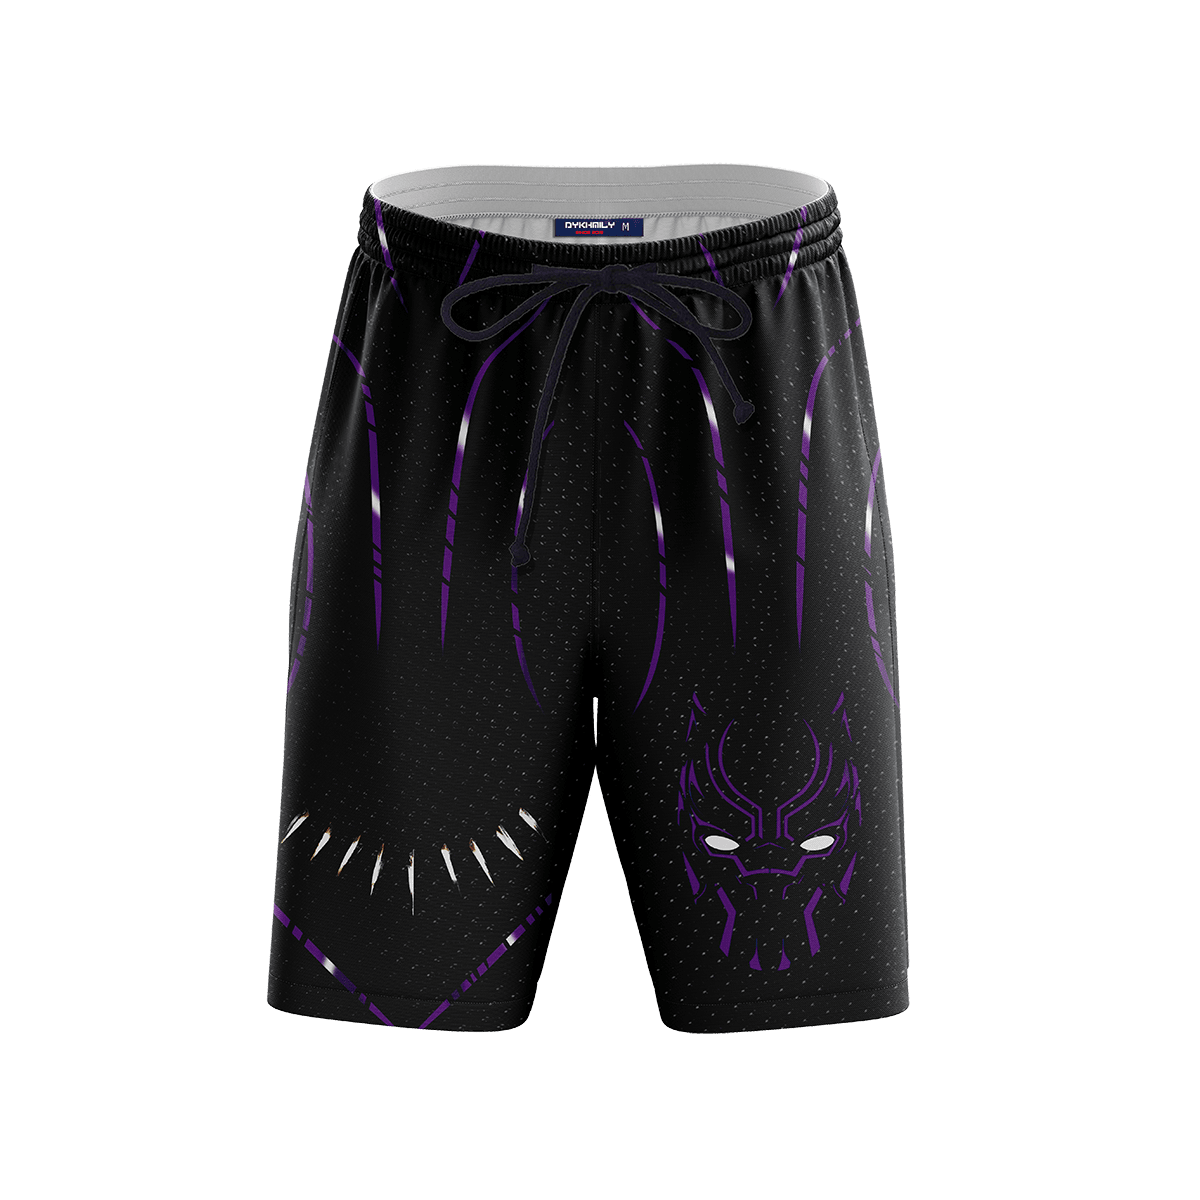 The King Beach Shorts FDM3107 S Official Anime Swimsuit Merch